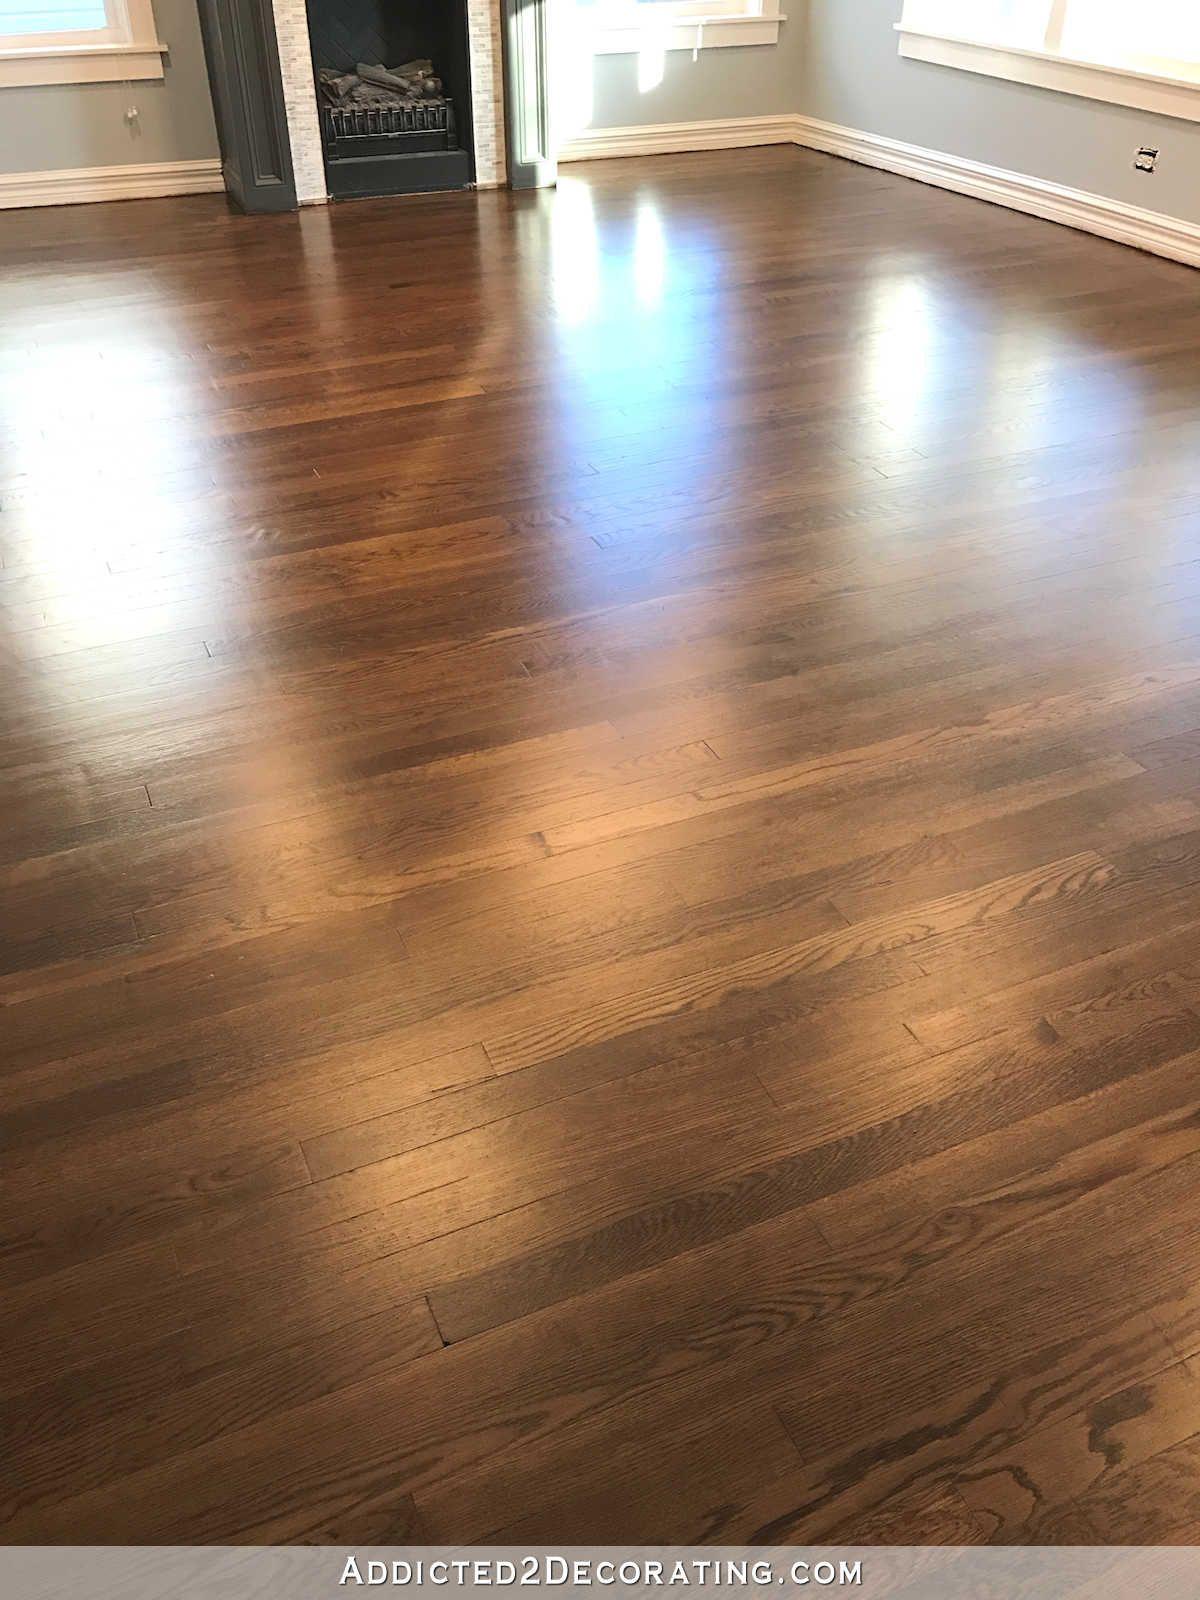 Oak Wood Floors Accent Gray Walls Highlighting A White: Waterlox Vs. Polyurethane For Hardwood Floors